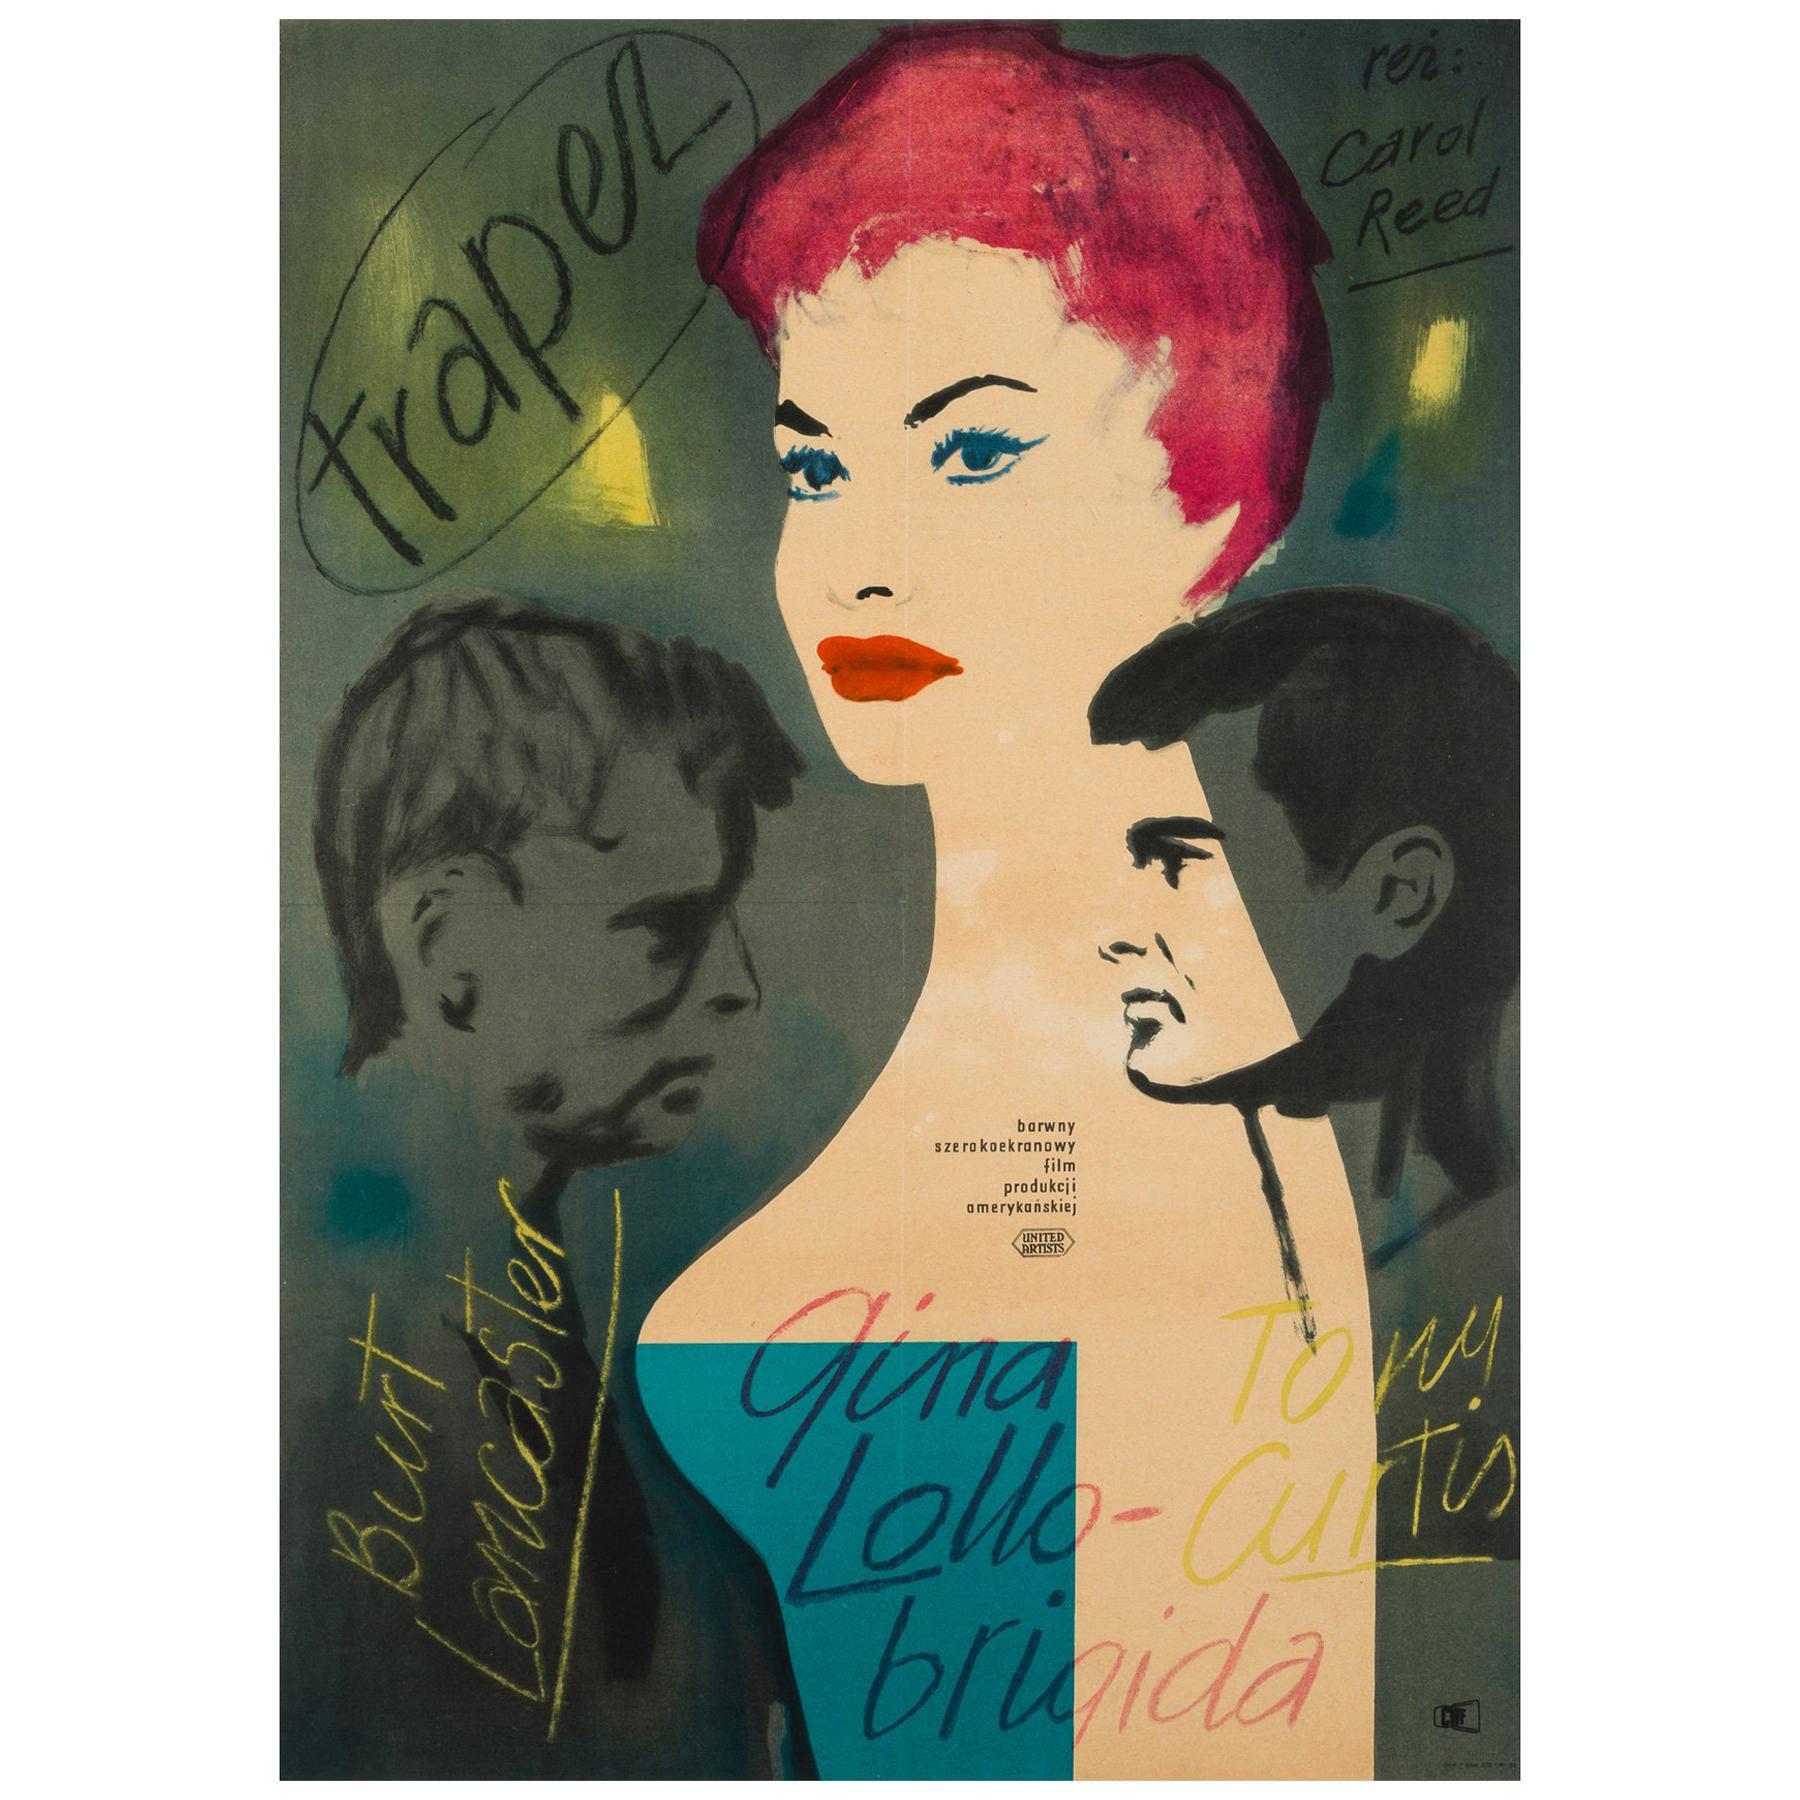 Trapeze Original Polish Film Poster, 1956